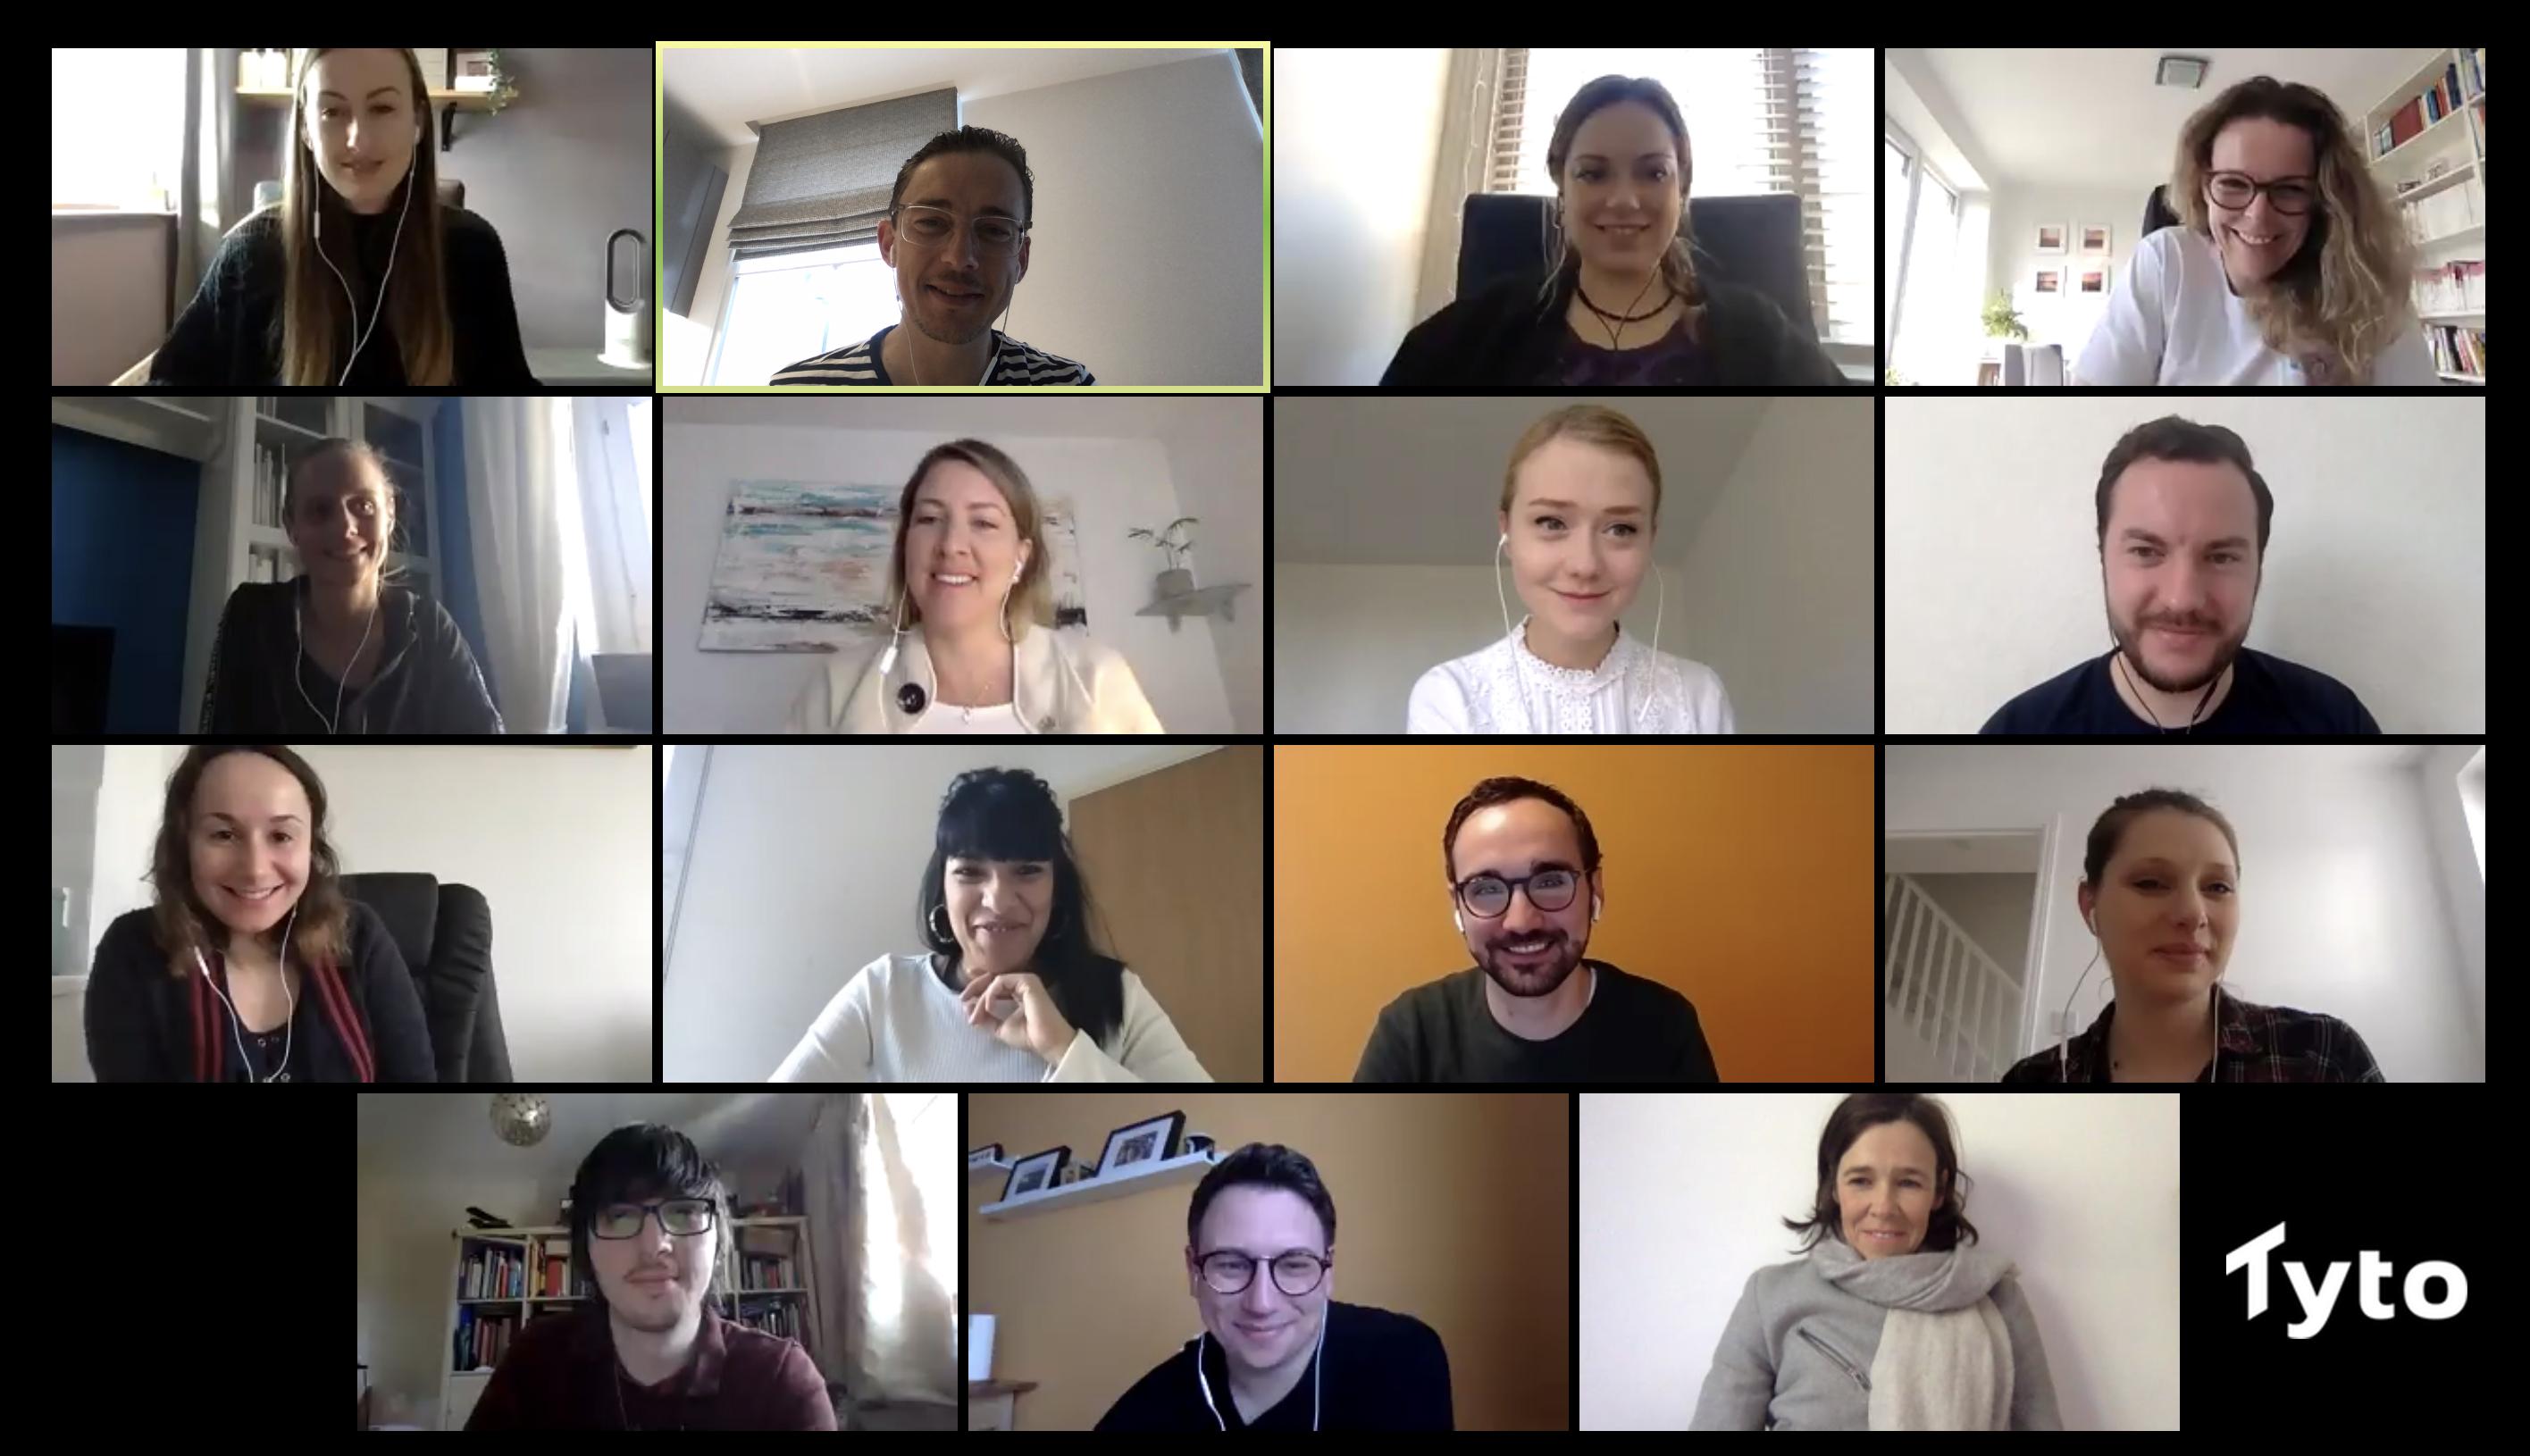 Tyto Team Remote Working